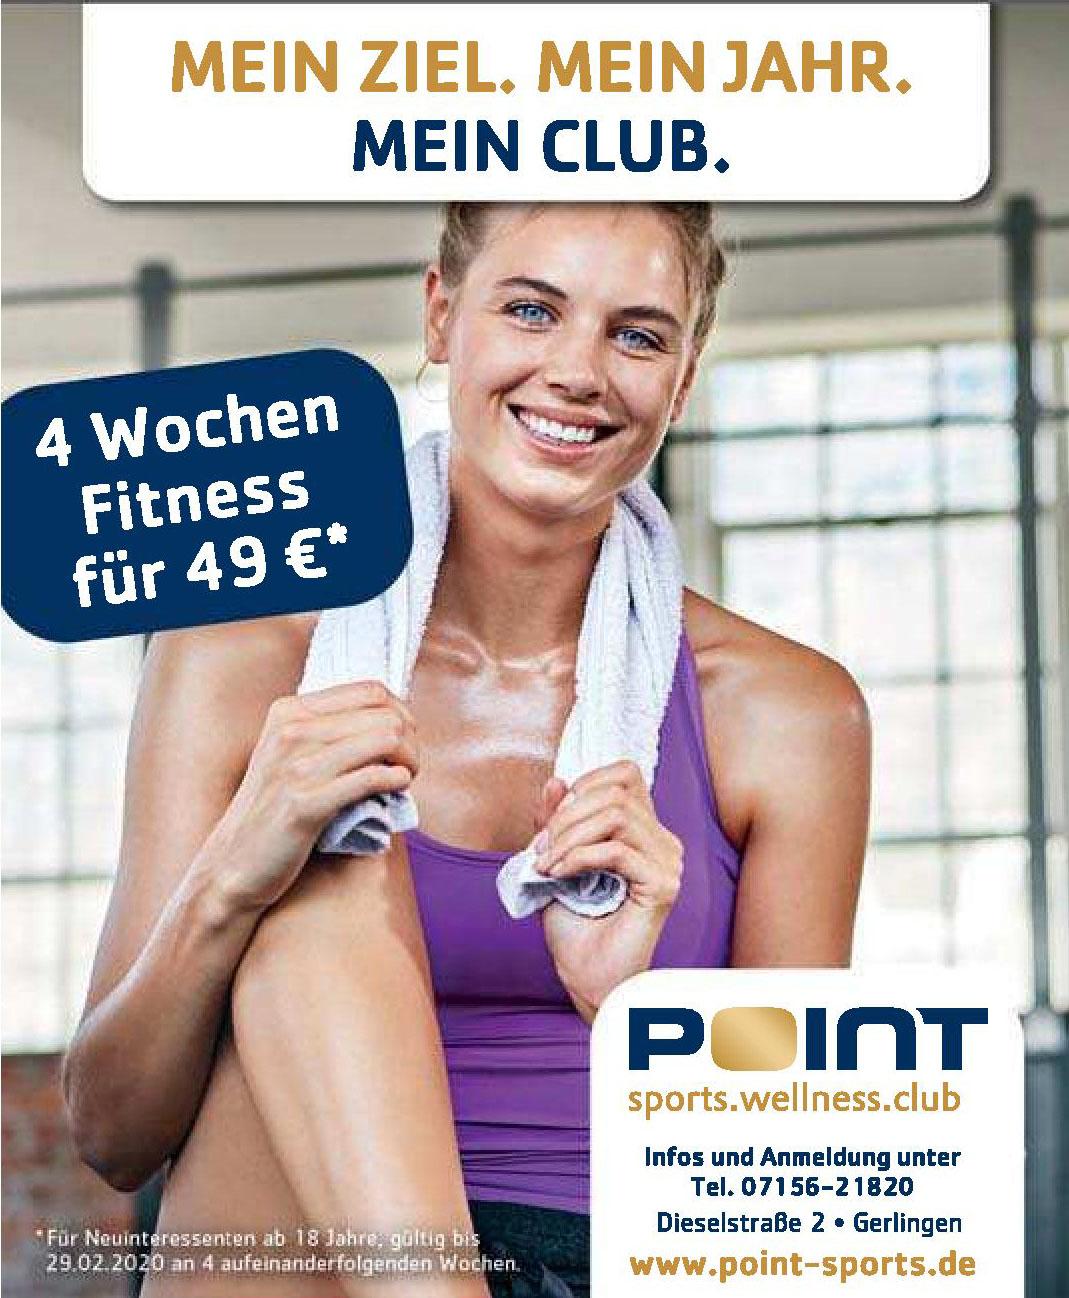 Point sports.wellness.club